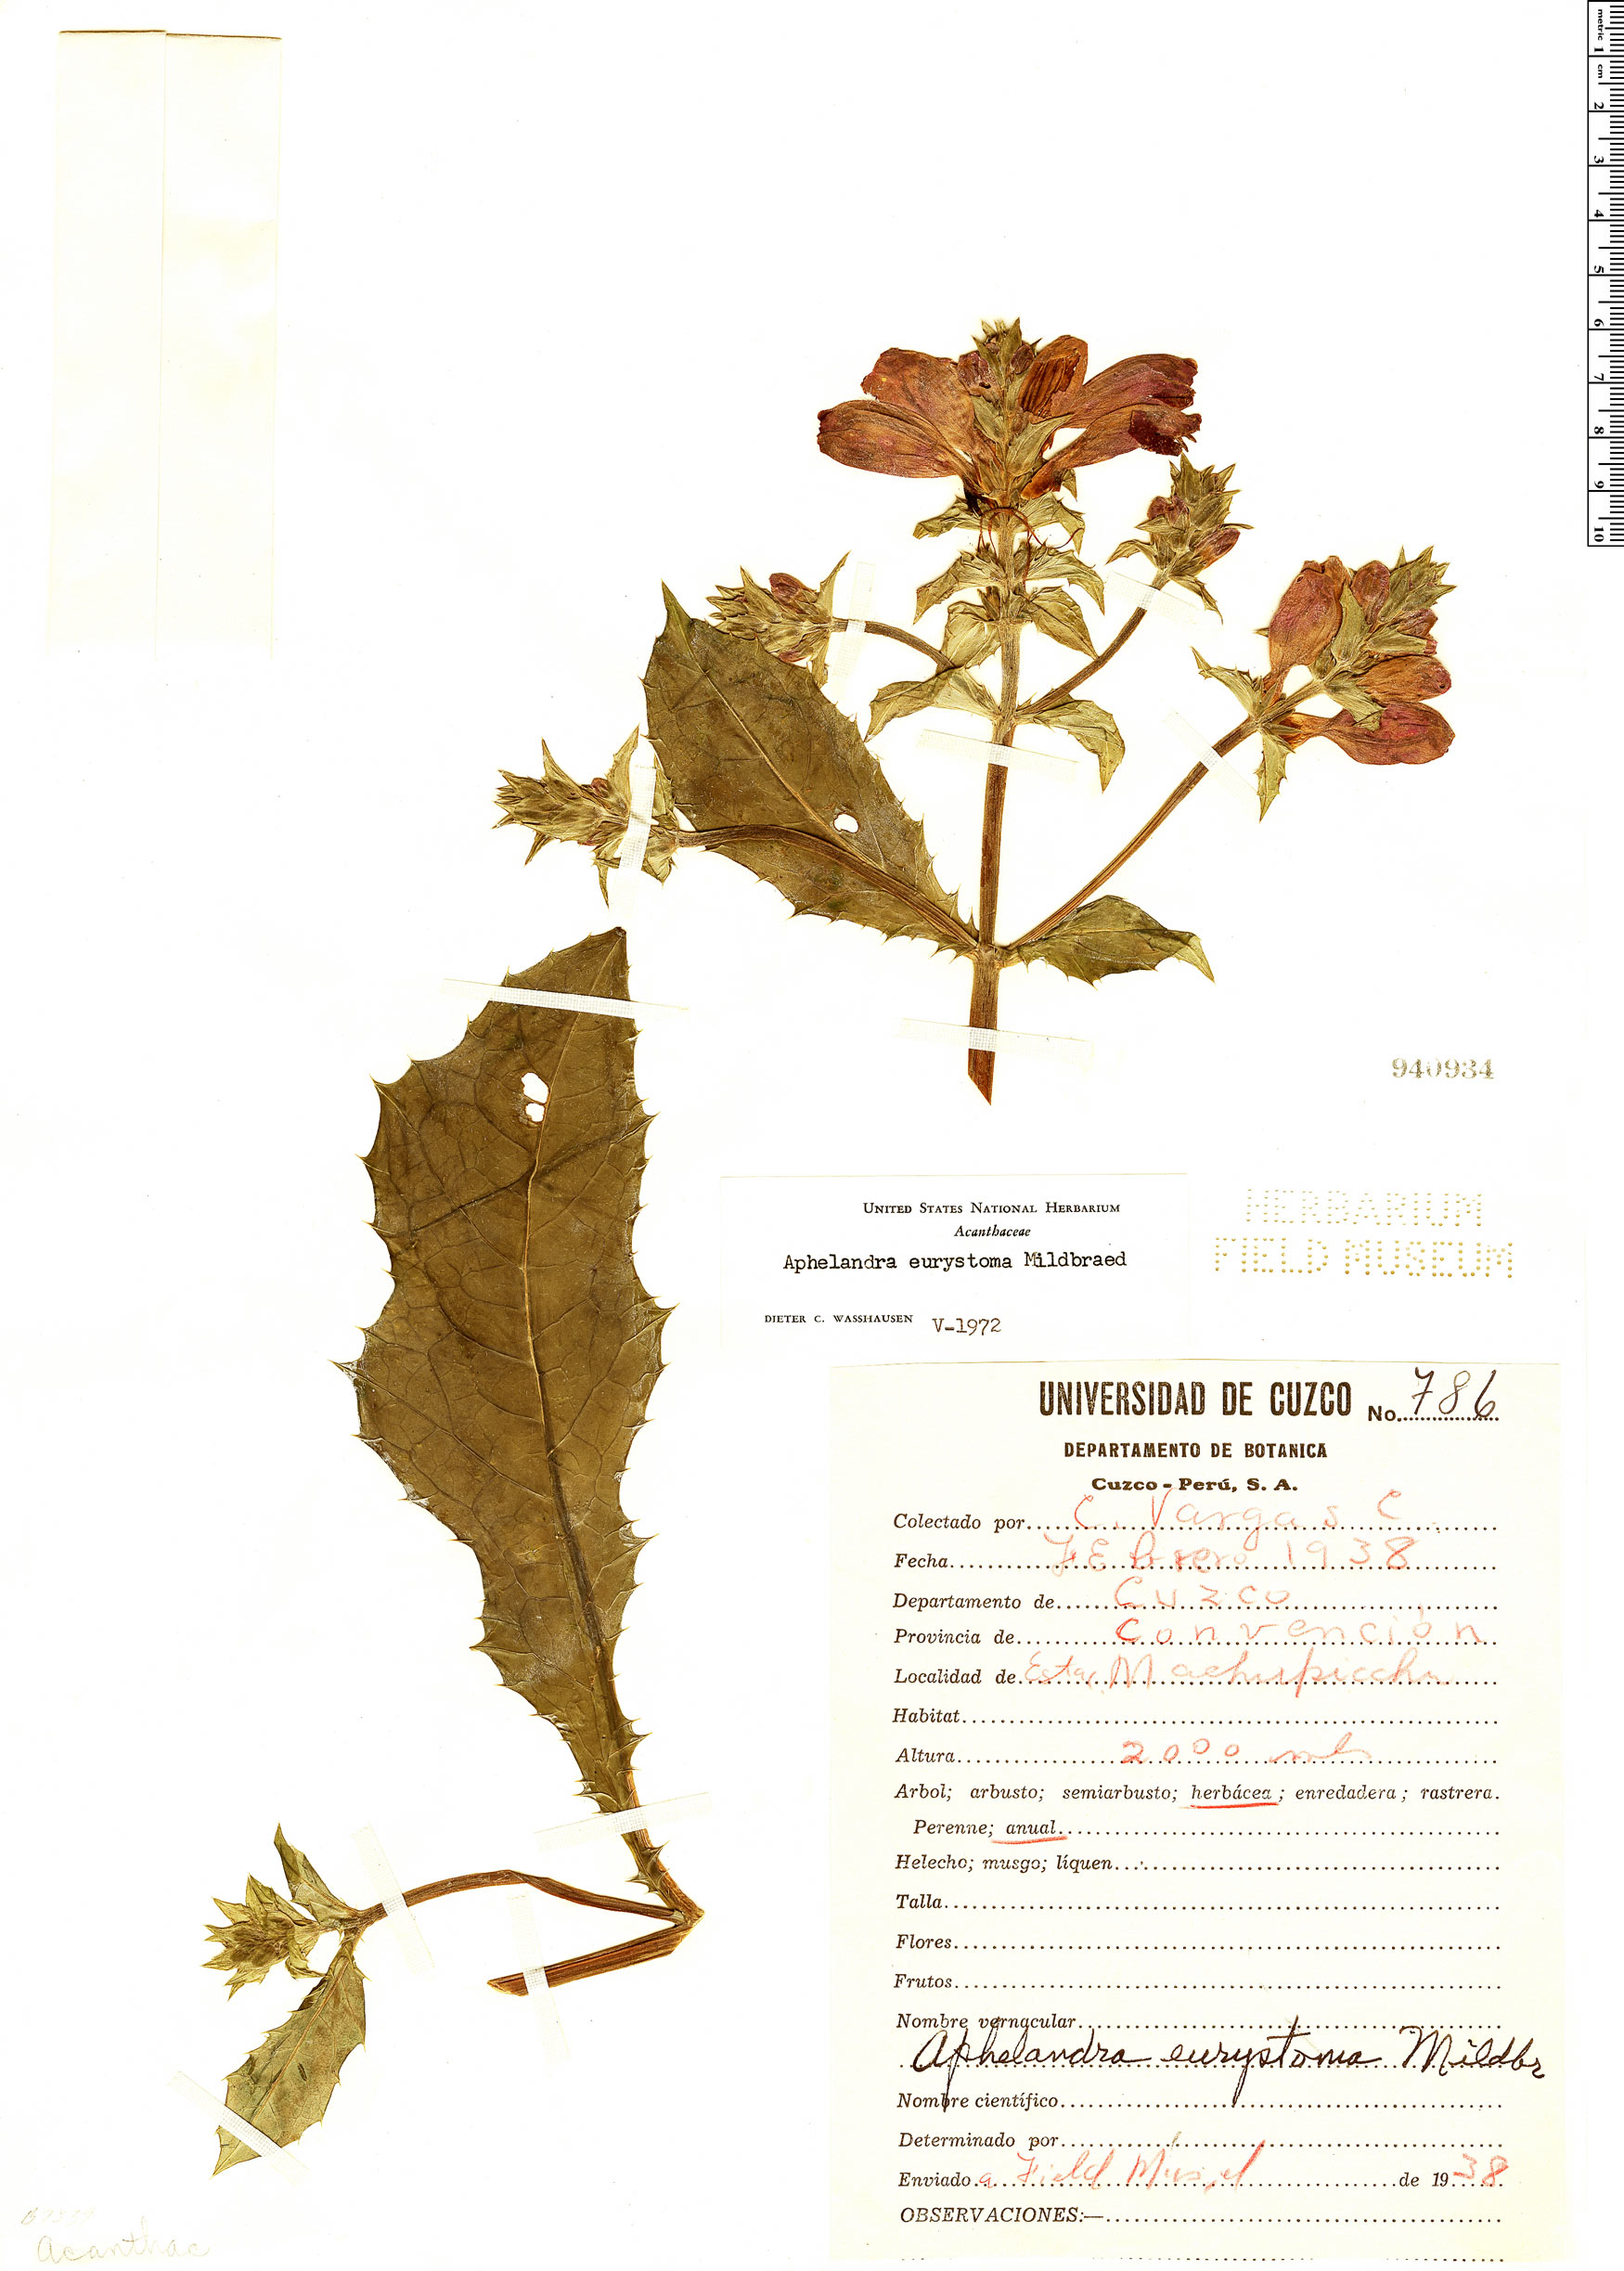 Specimen: Aphelandra eurystoma